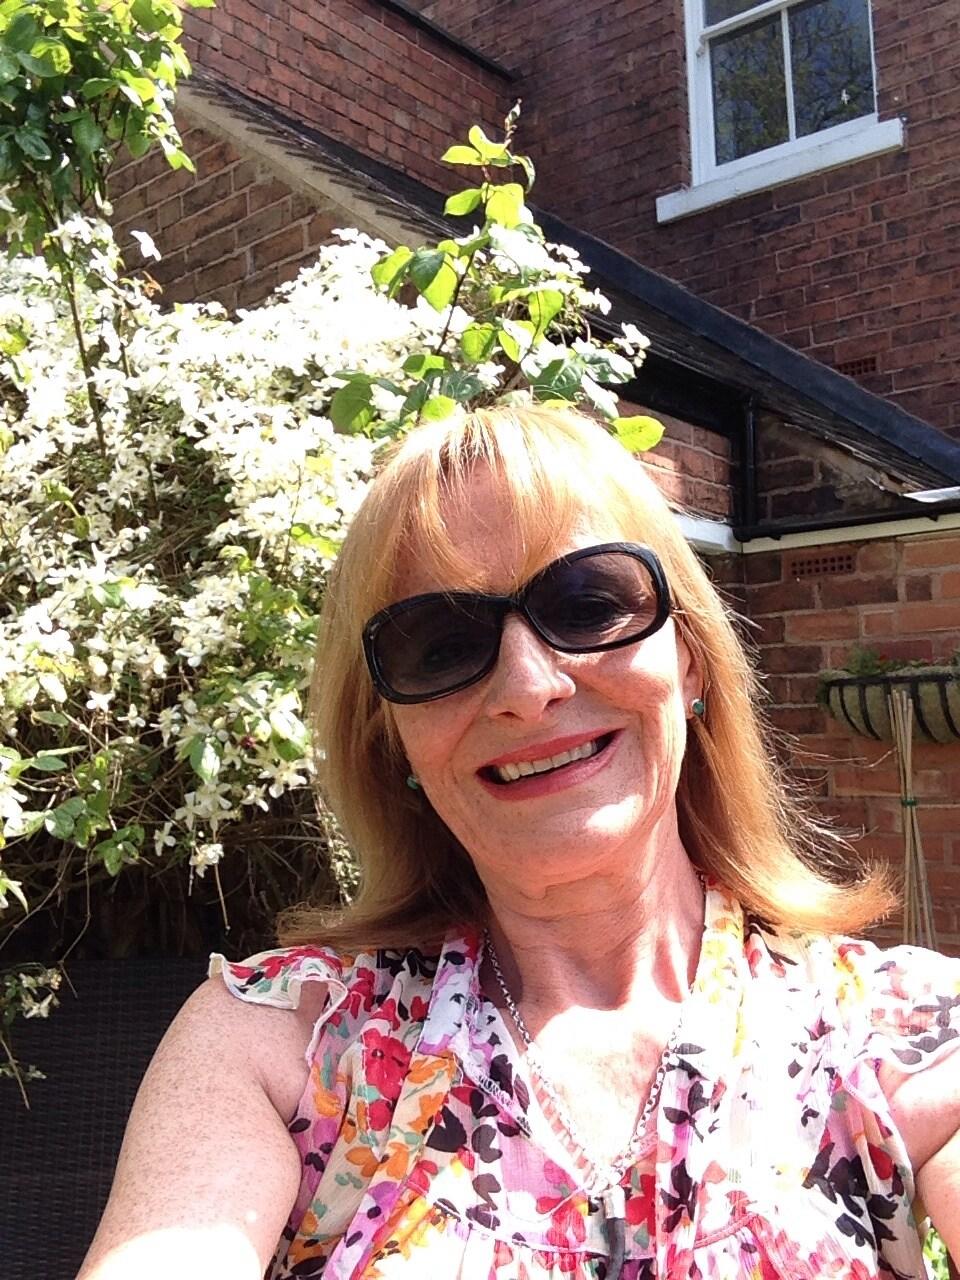 Anne-Marie from Birmingham